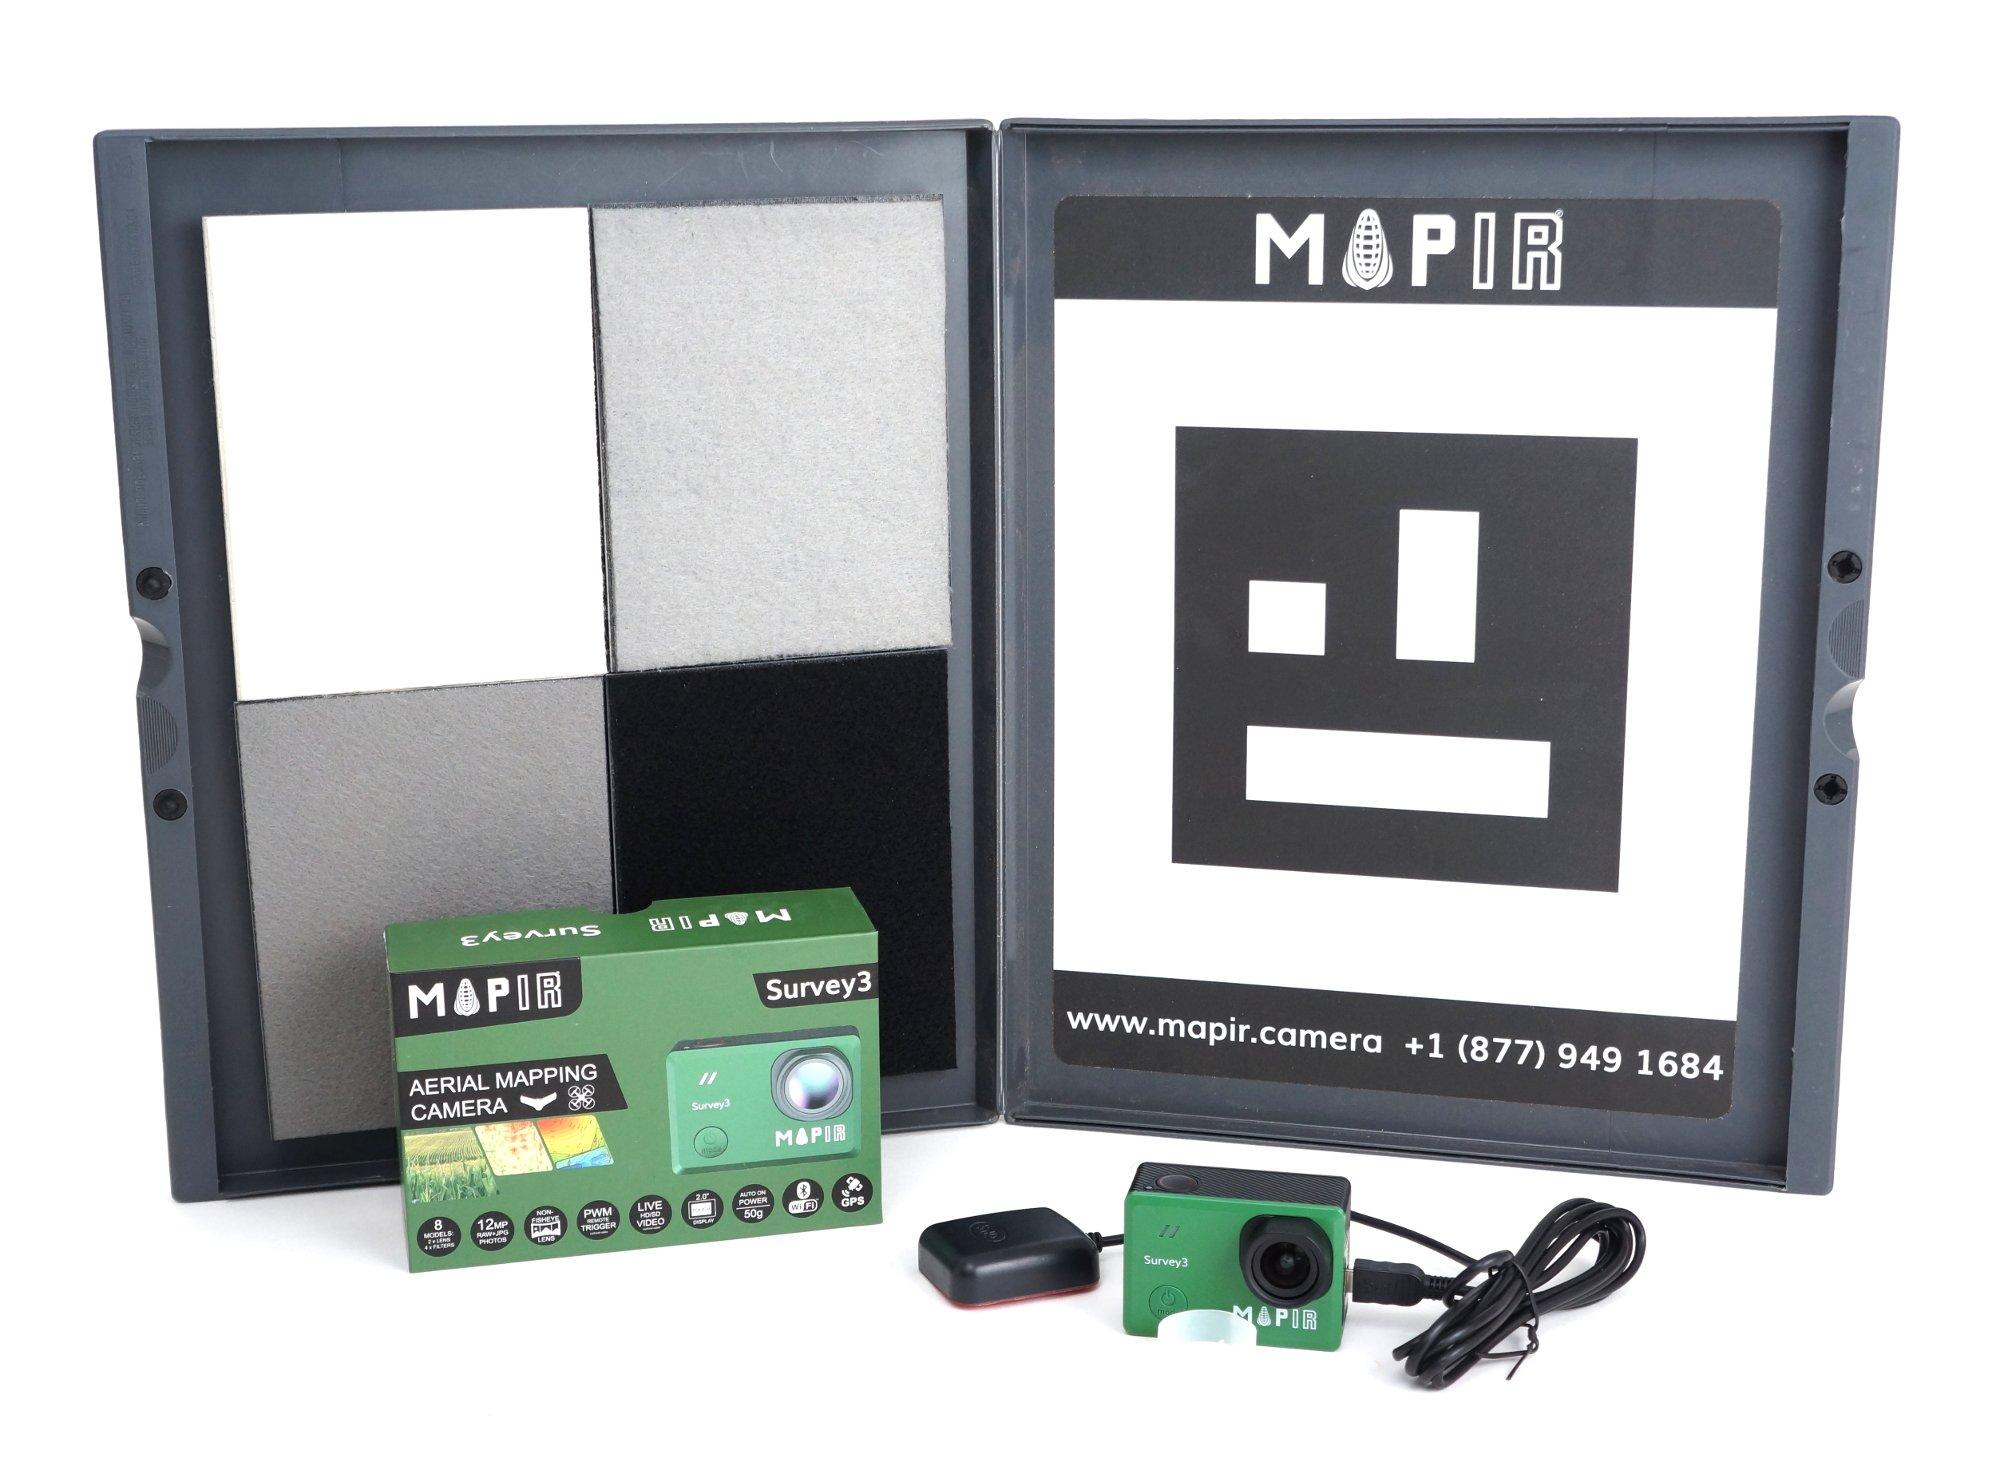 Mapir Survey3 Camera